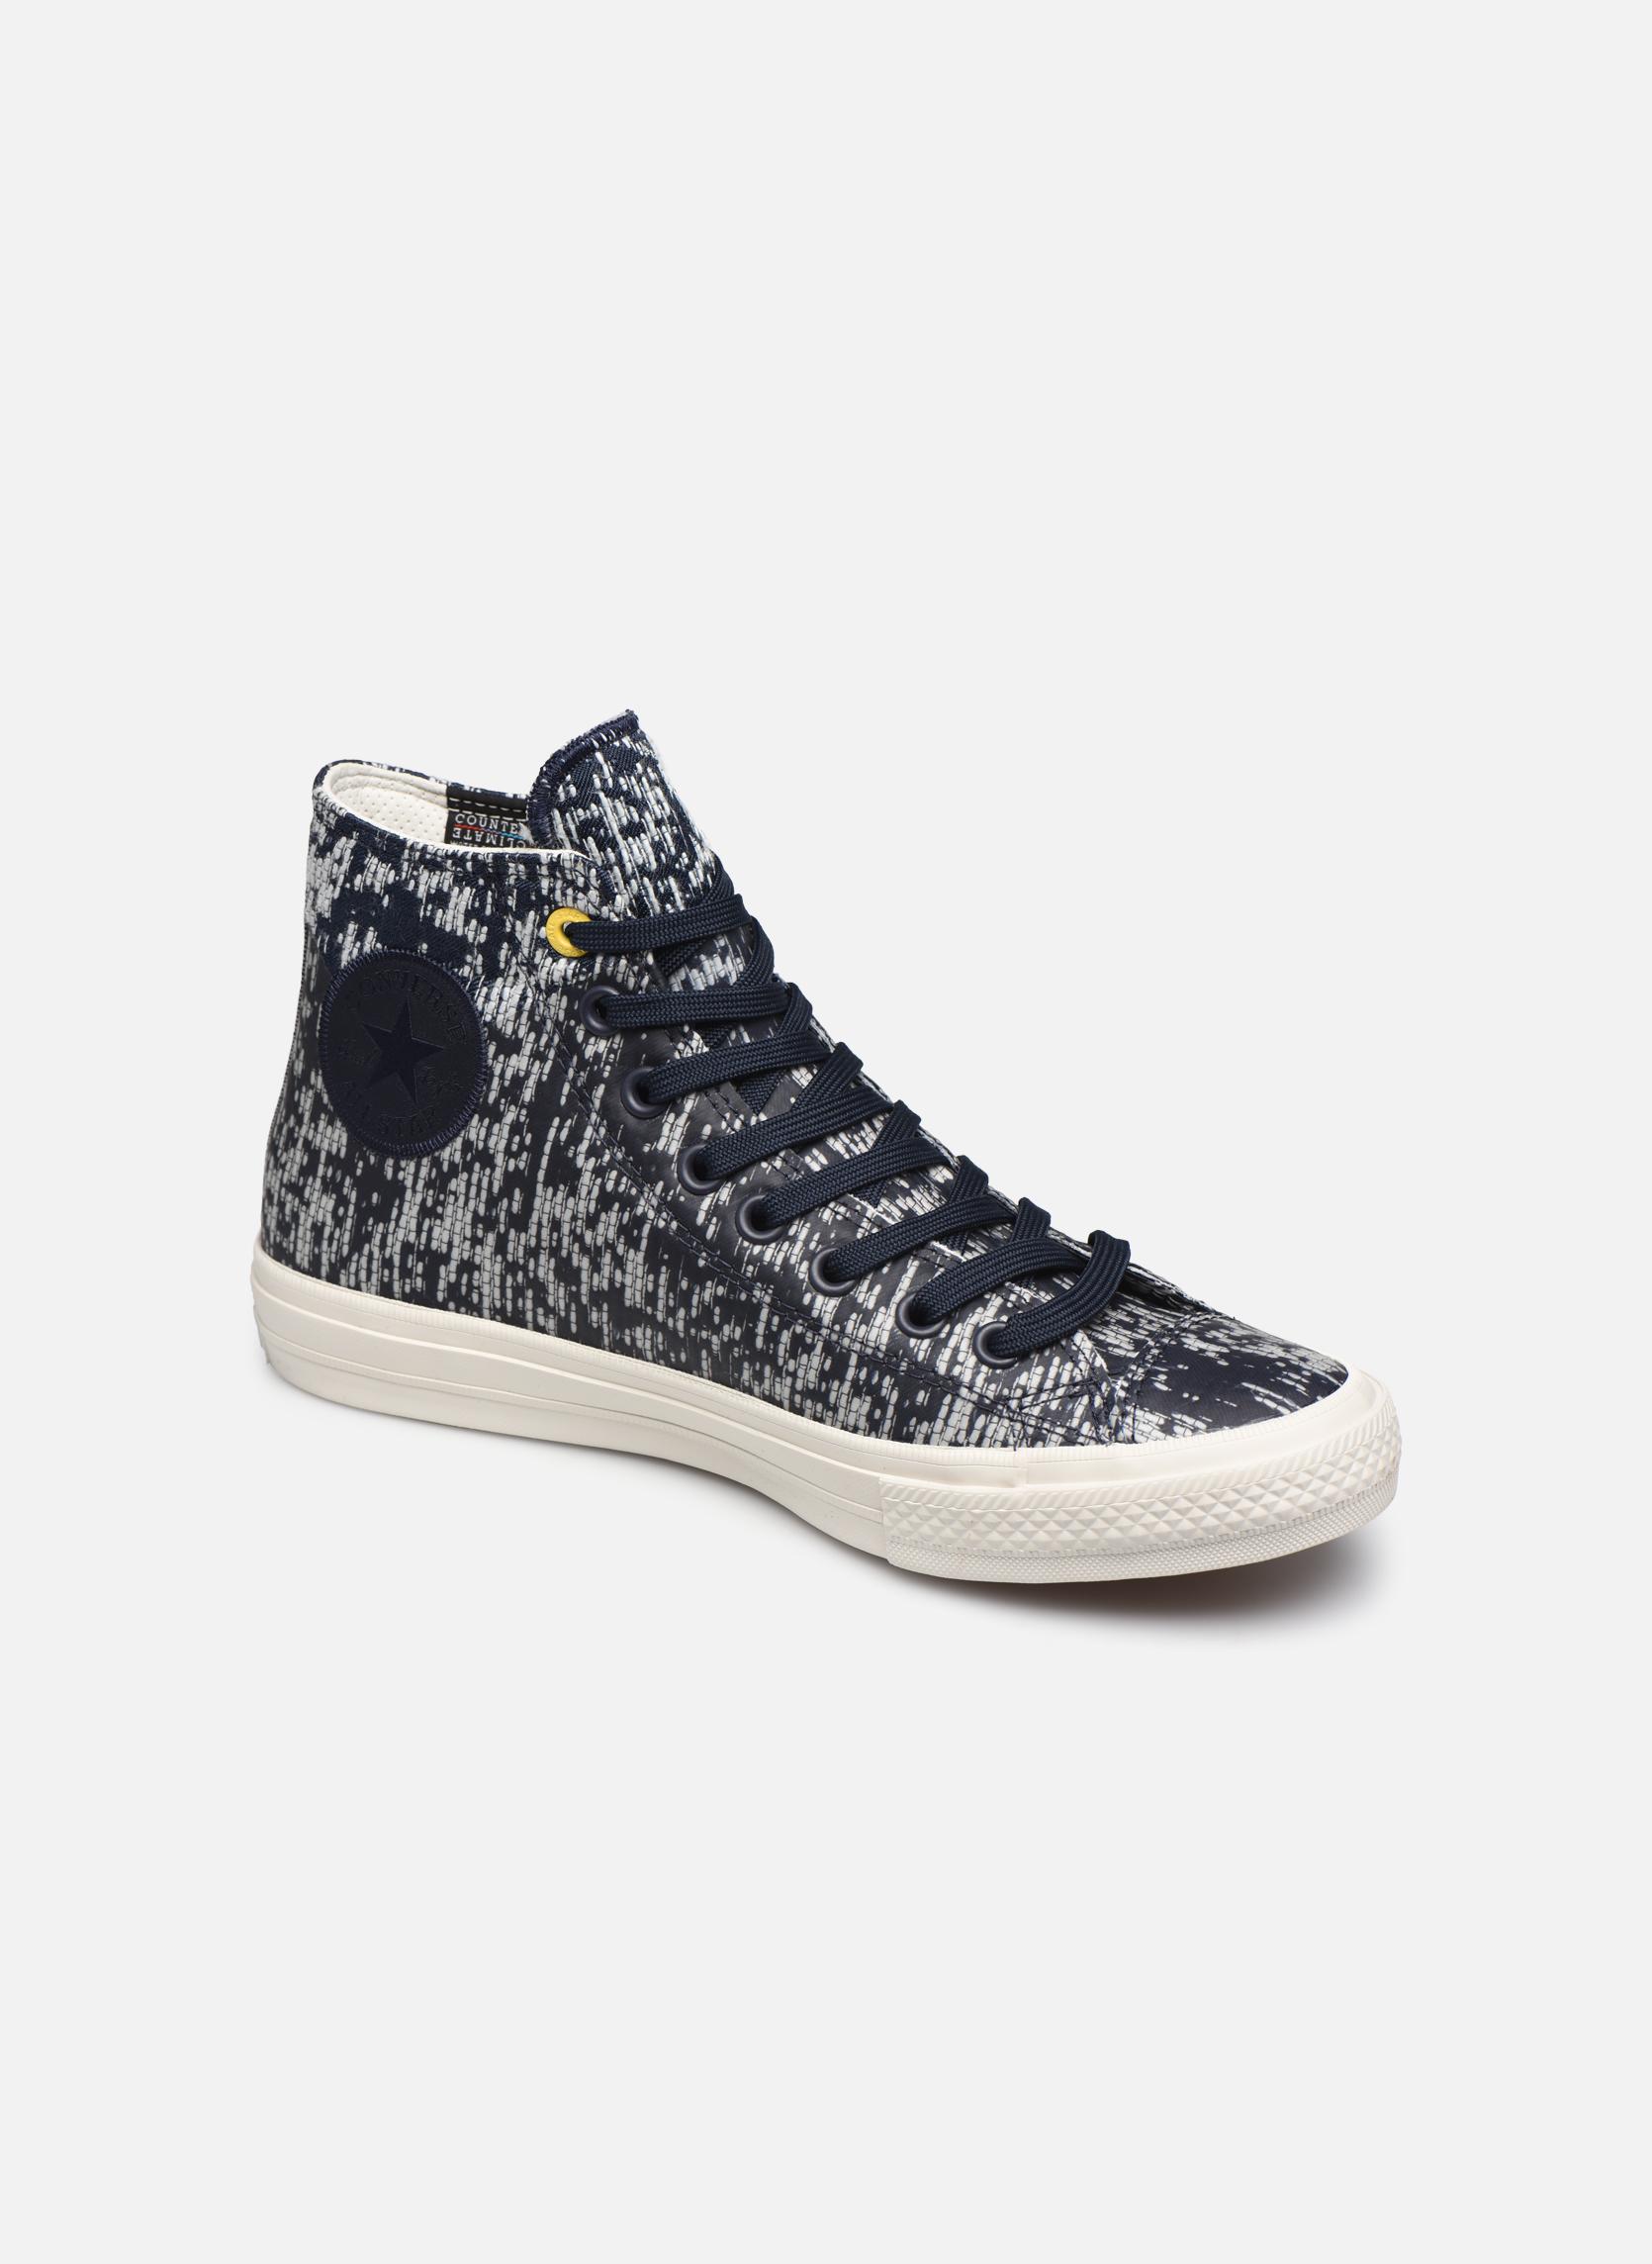 Uomo Converse Chuck Taylor All Star Ii Rubber Hi M Sneakers Grigio